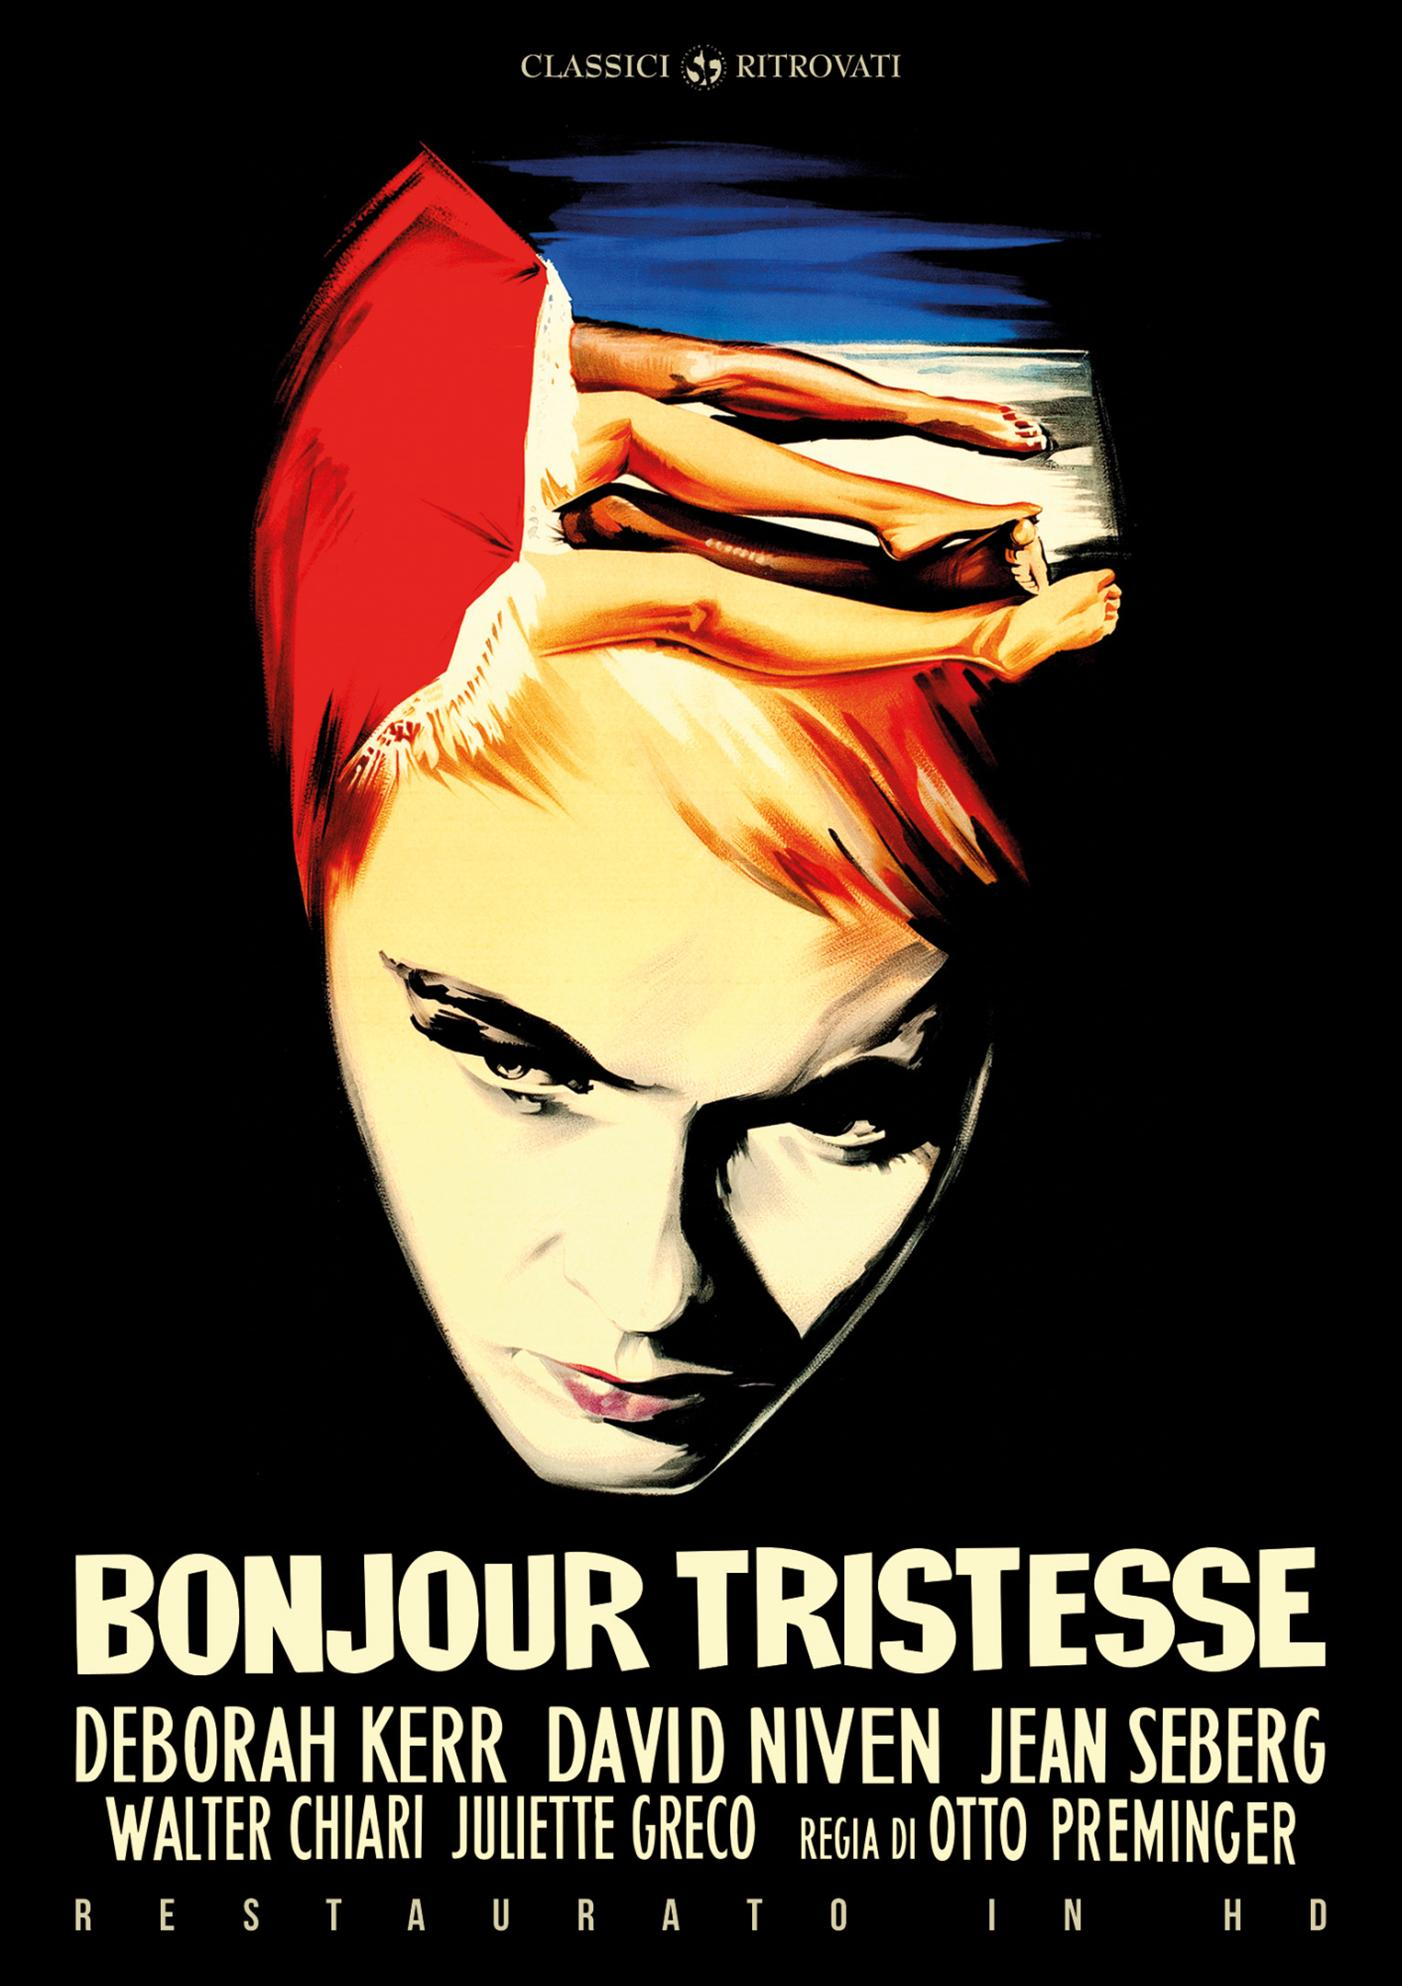 BONJOUR TRISTESSE (RESTAURATO IN HD) (DVD)